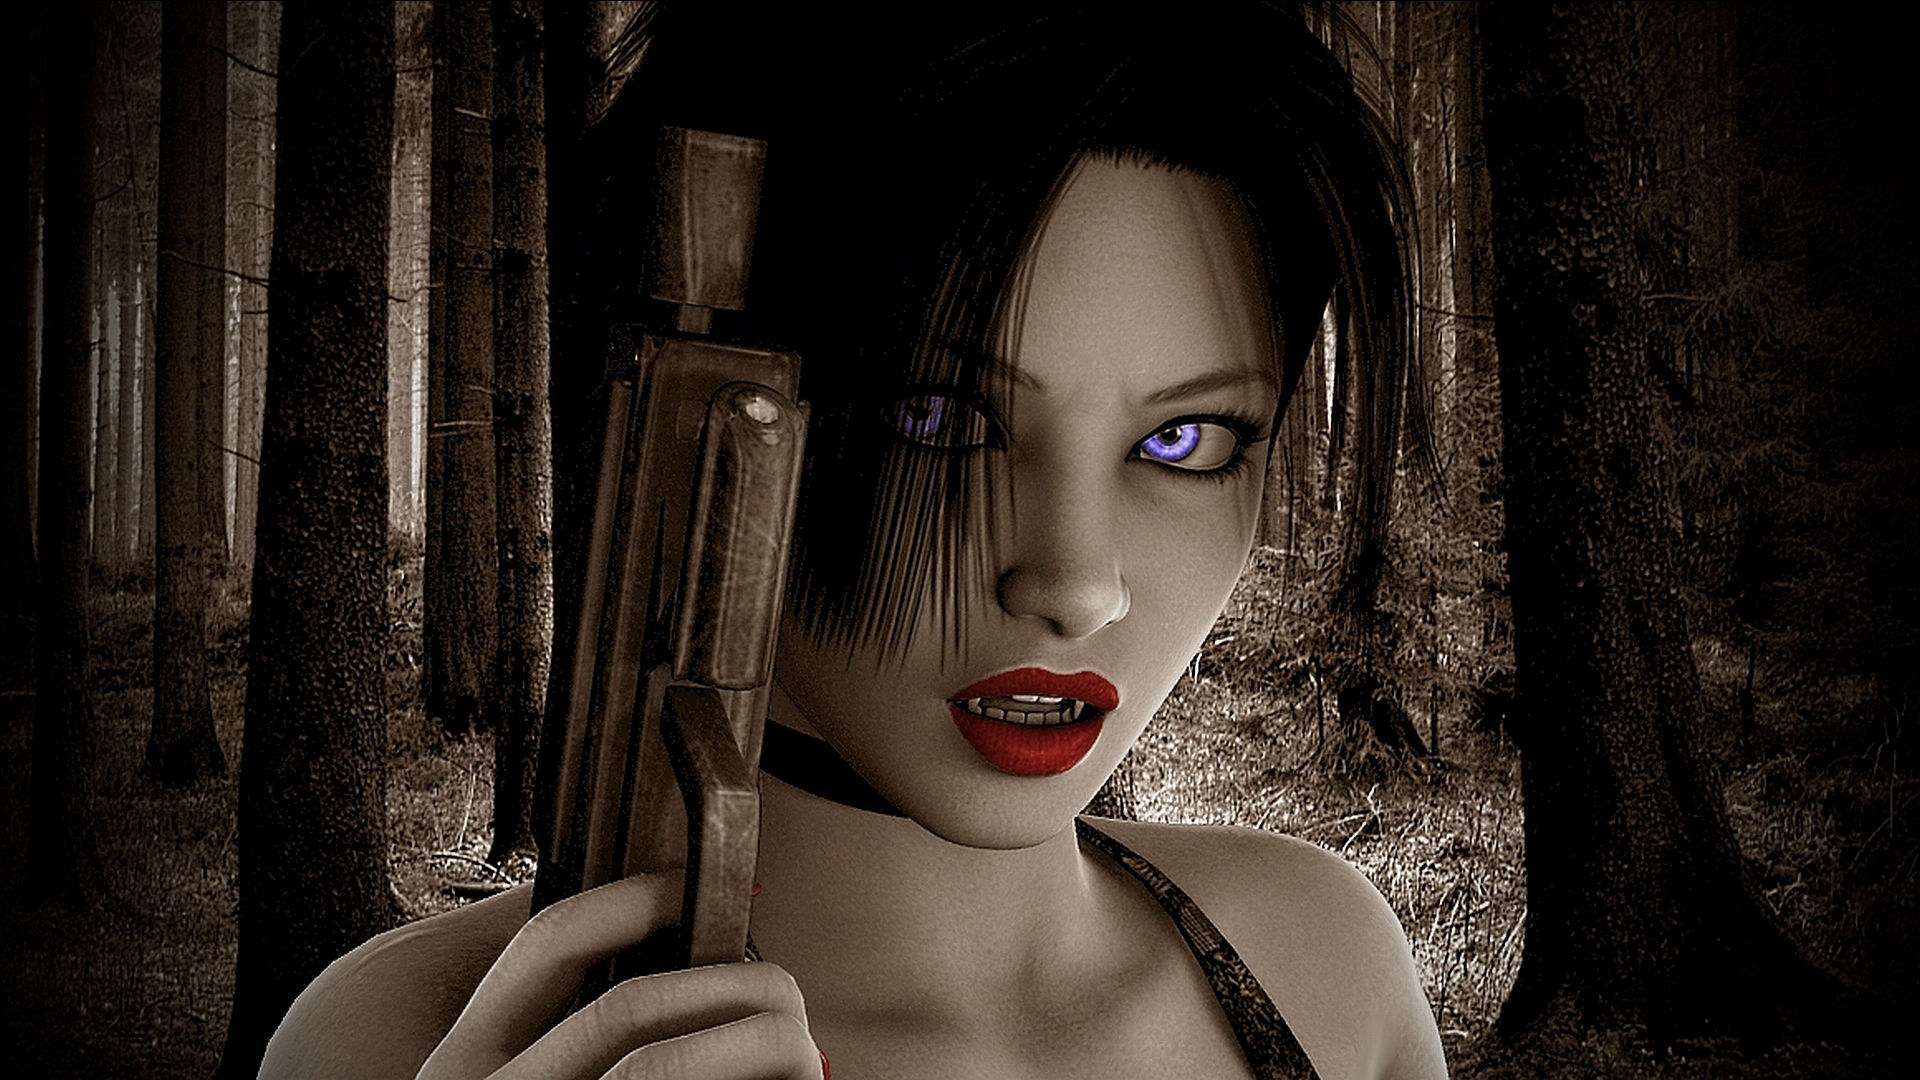 amazing girl with gun widescreen wallpaper